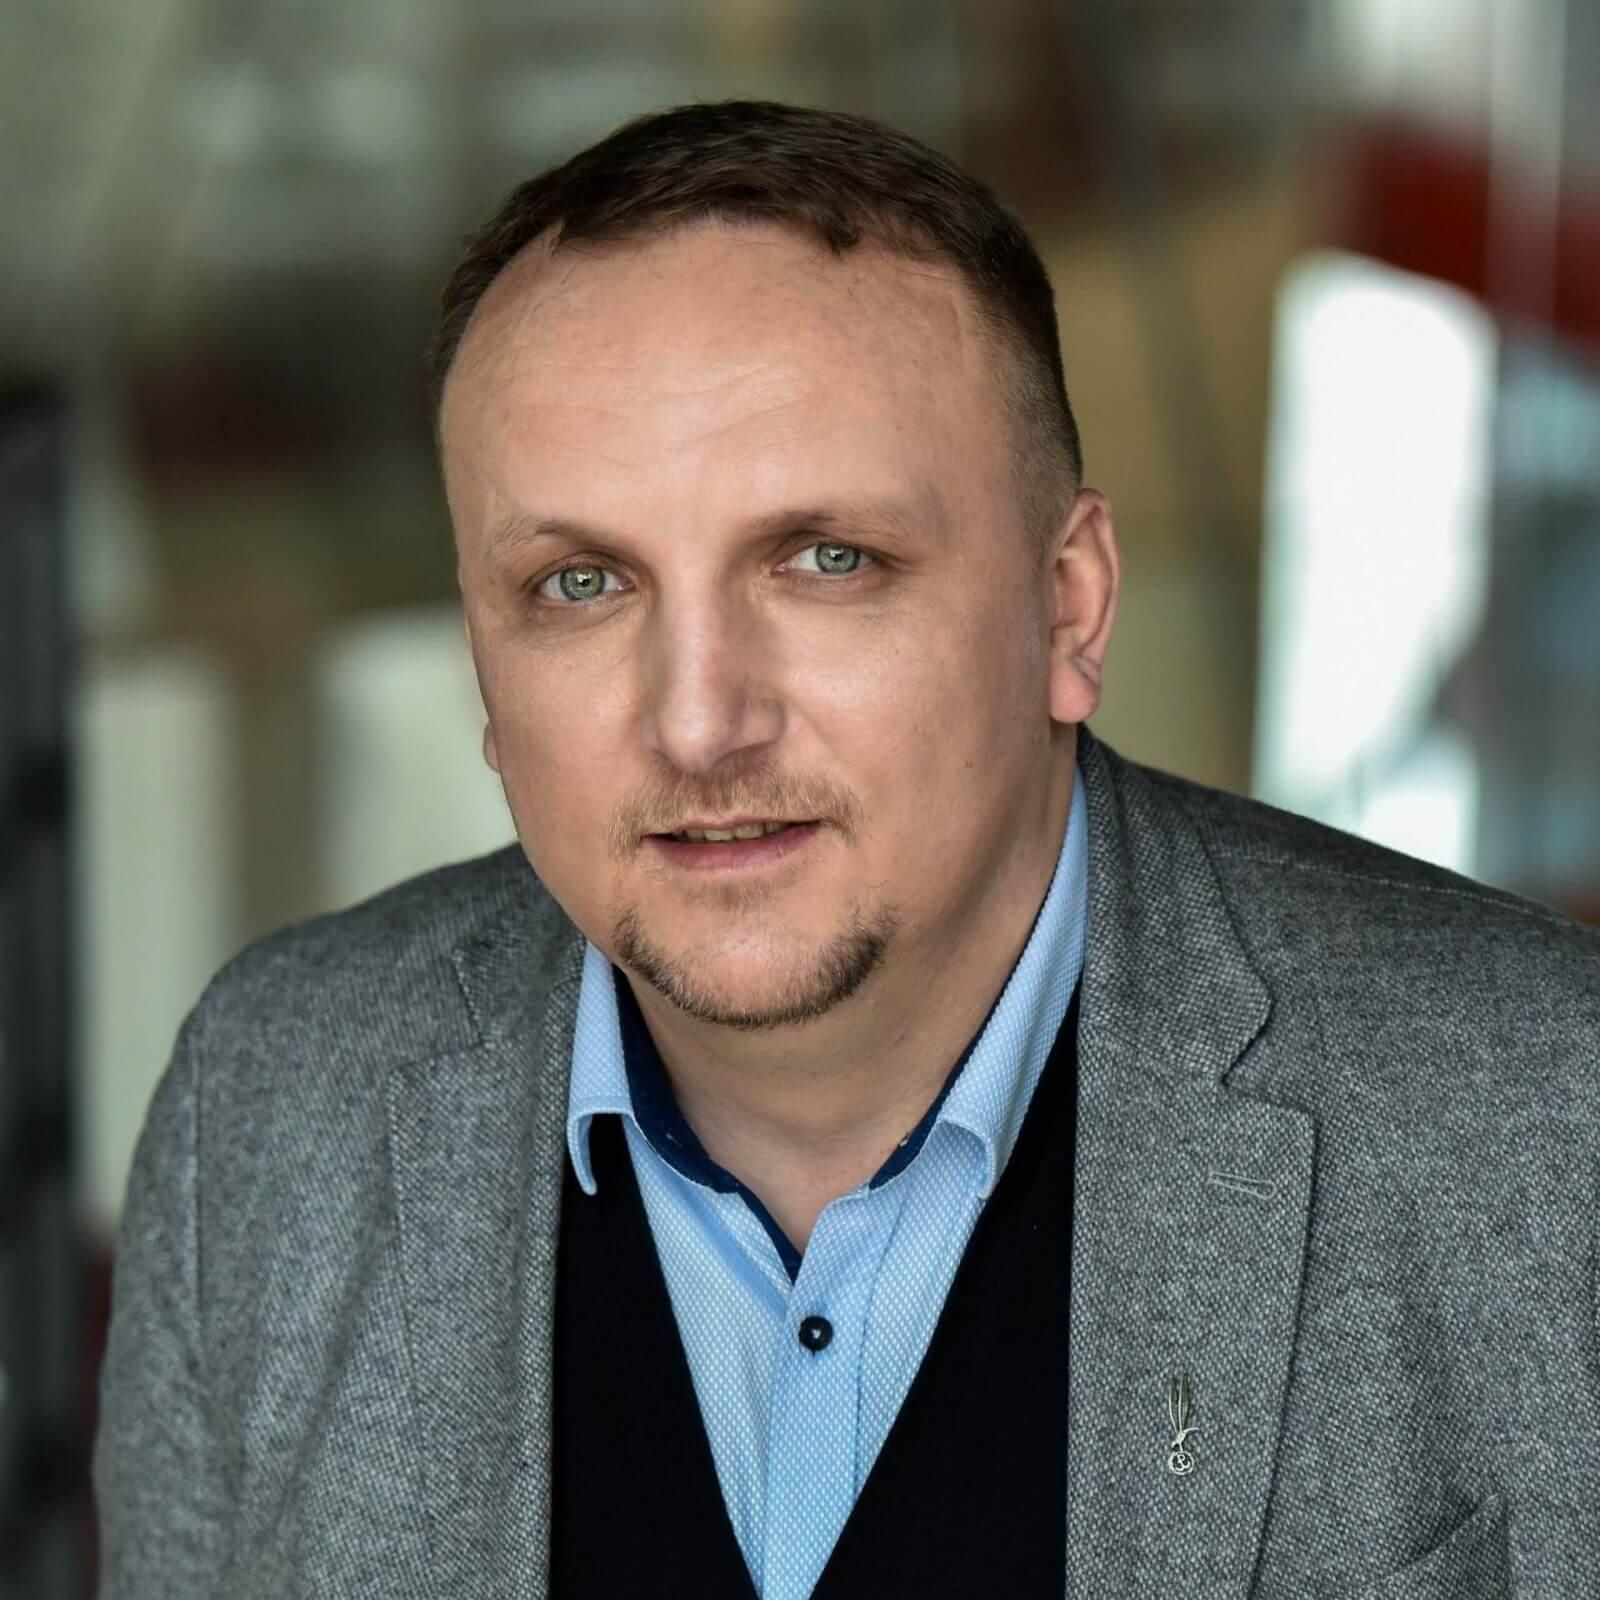 Beniamin Matecki